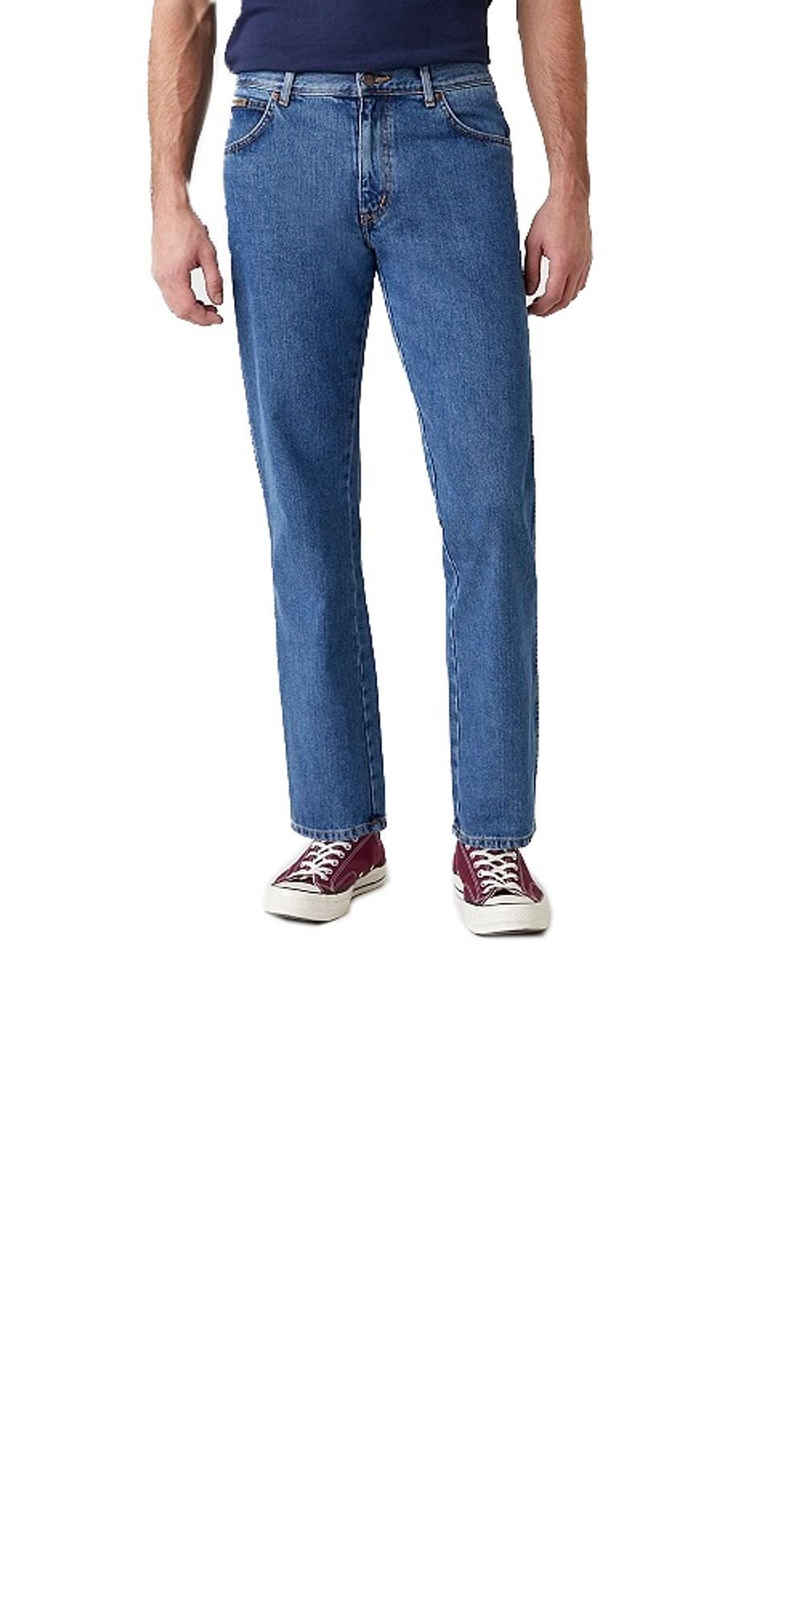 Wrangler 5-Pocket-Jeans »Texas 821 W12105« Non Stretch